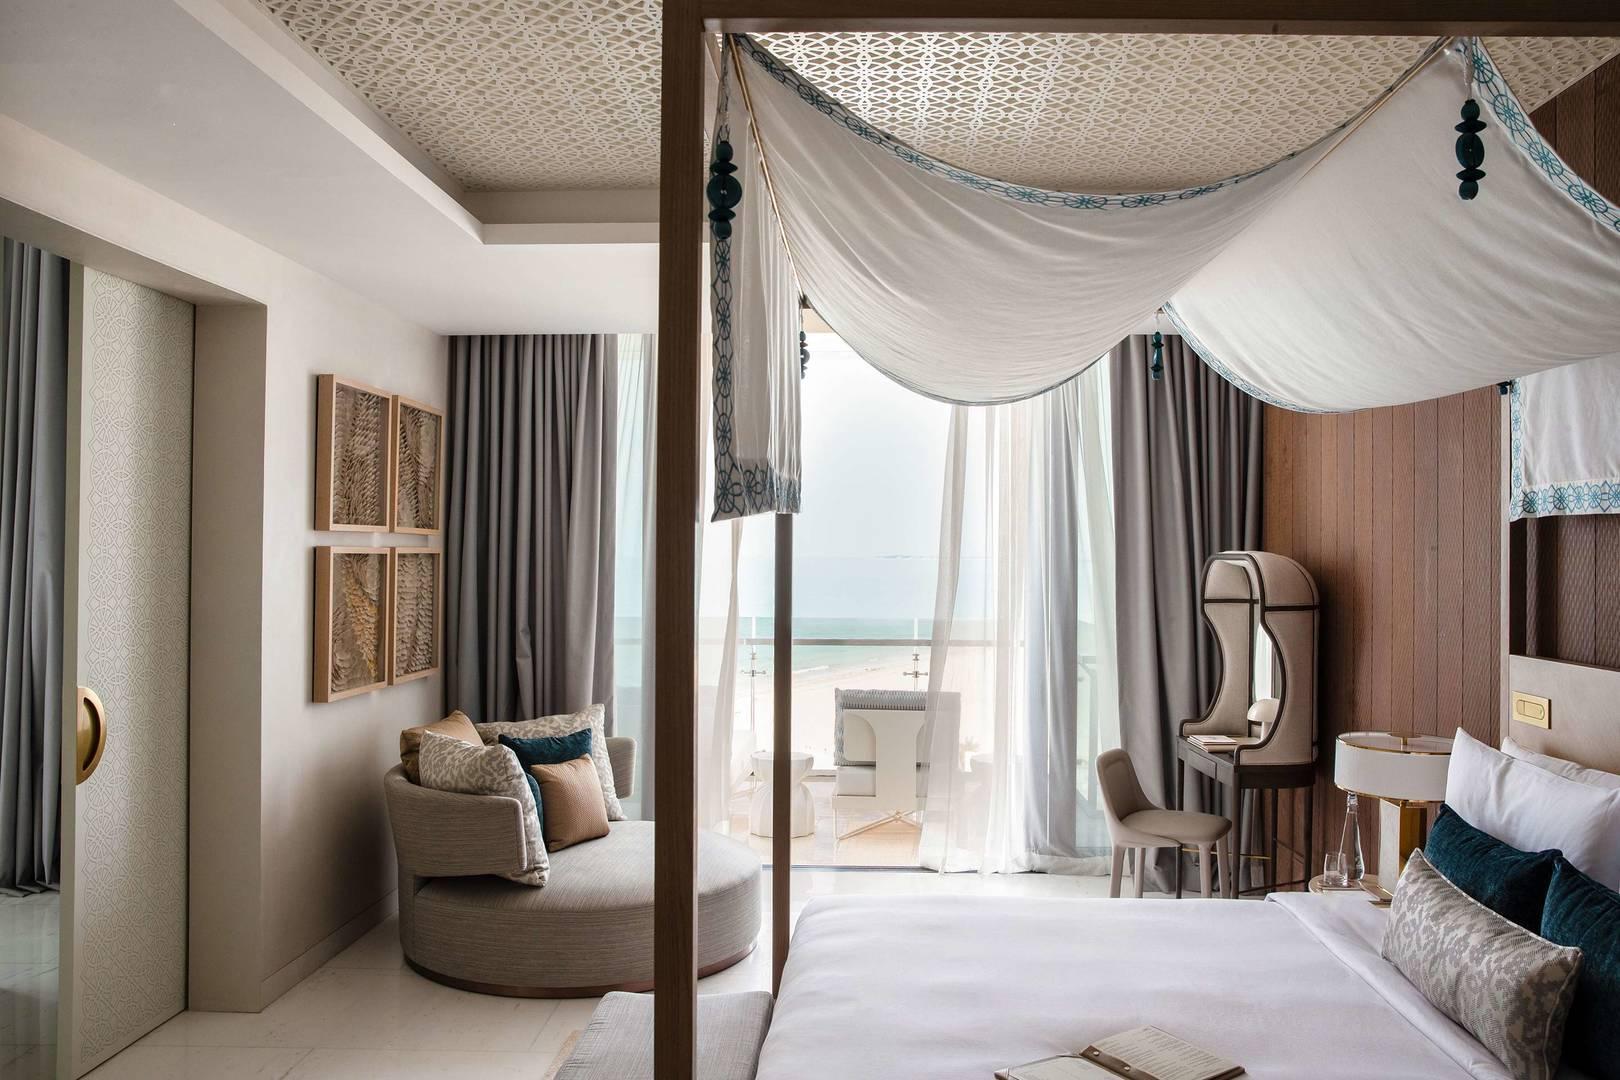 View at the king bedroom in Abu Dhabi Suite at Jumeirah Saadiyat Island Resort